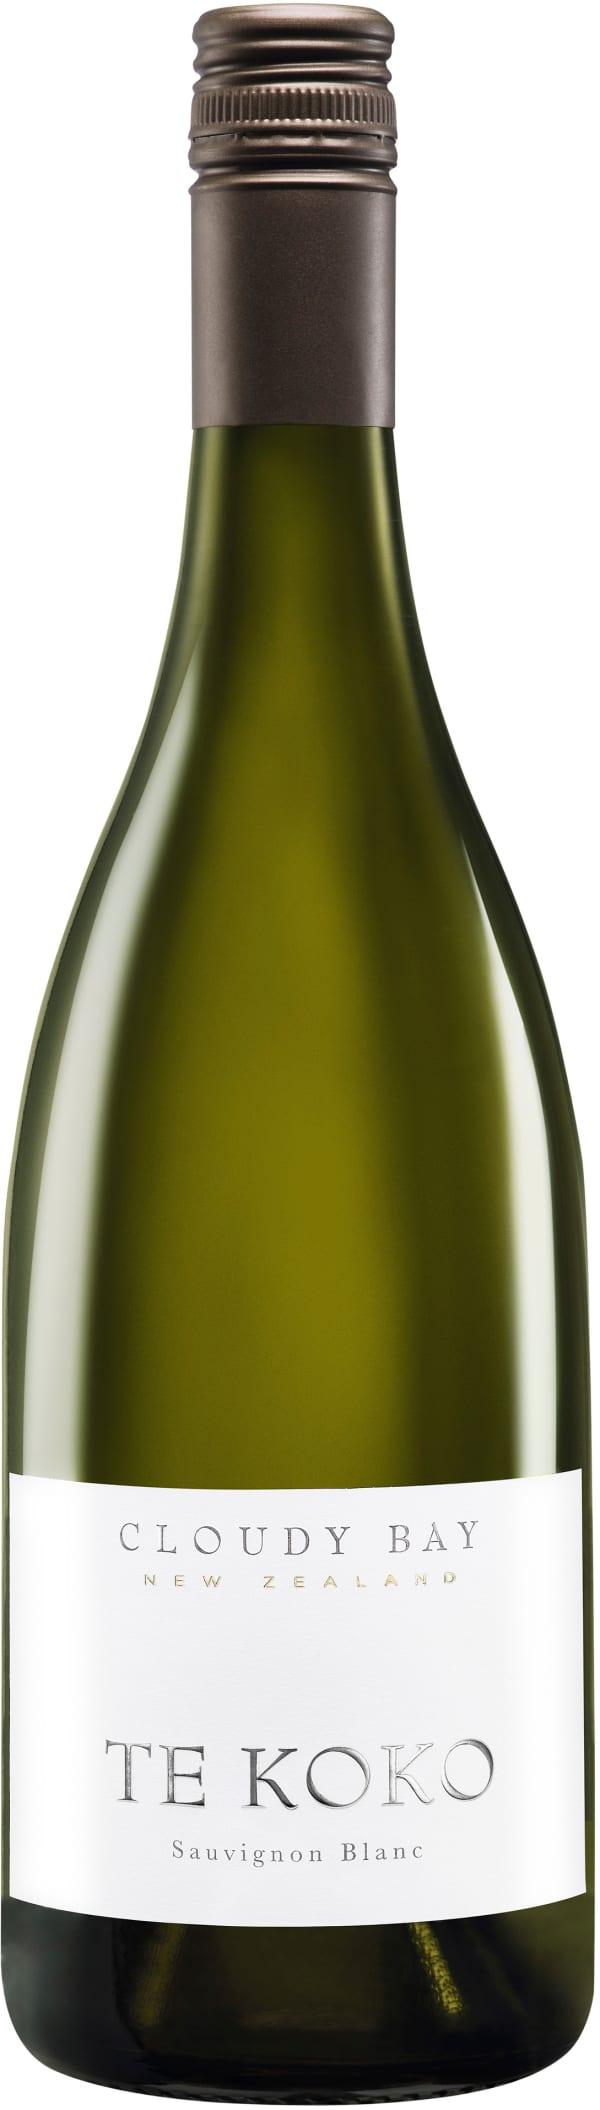 Cloudy Bay Te Koko Sauvignon Blanc 2014